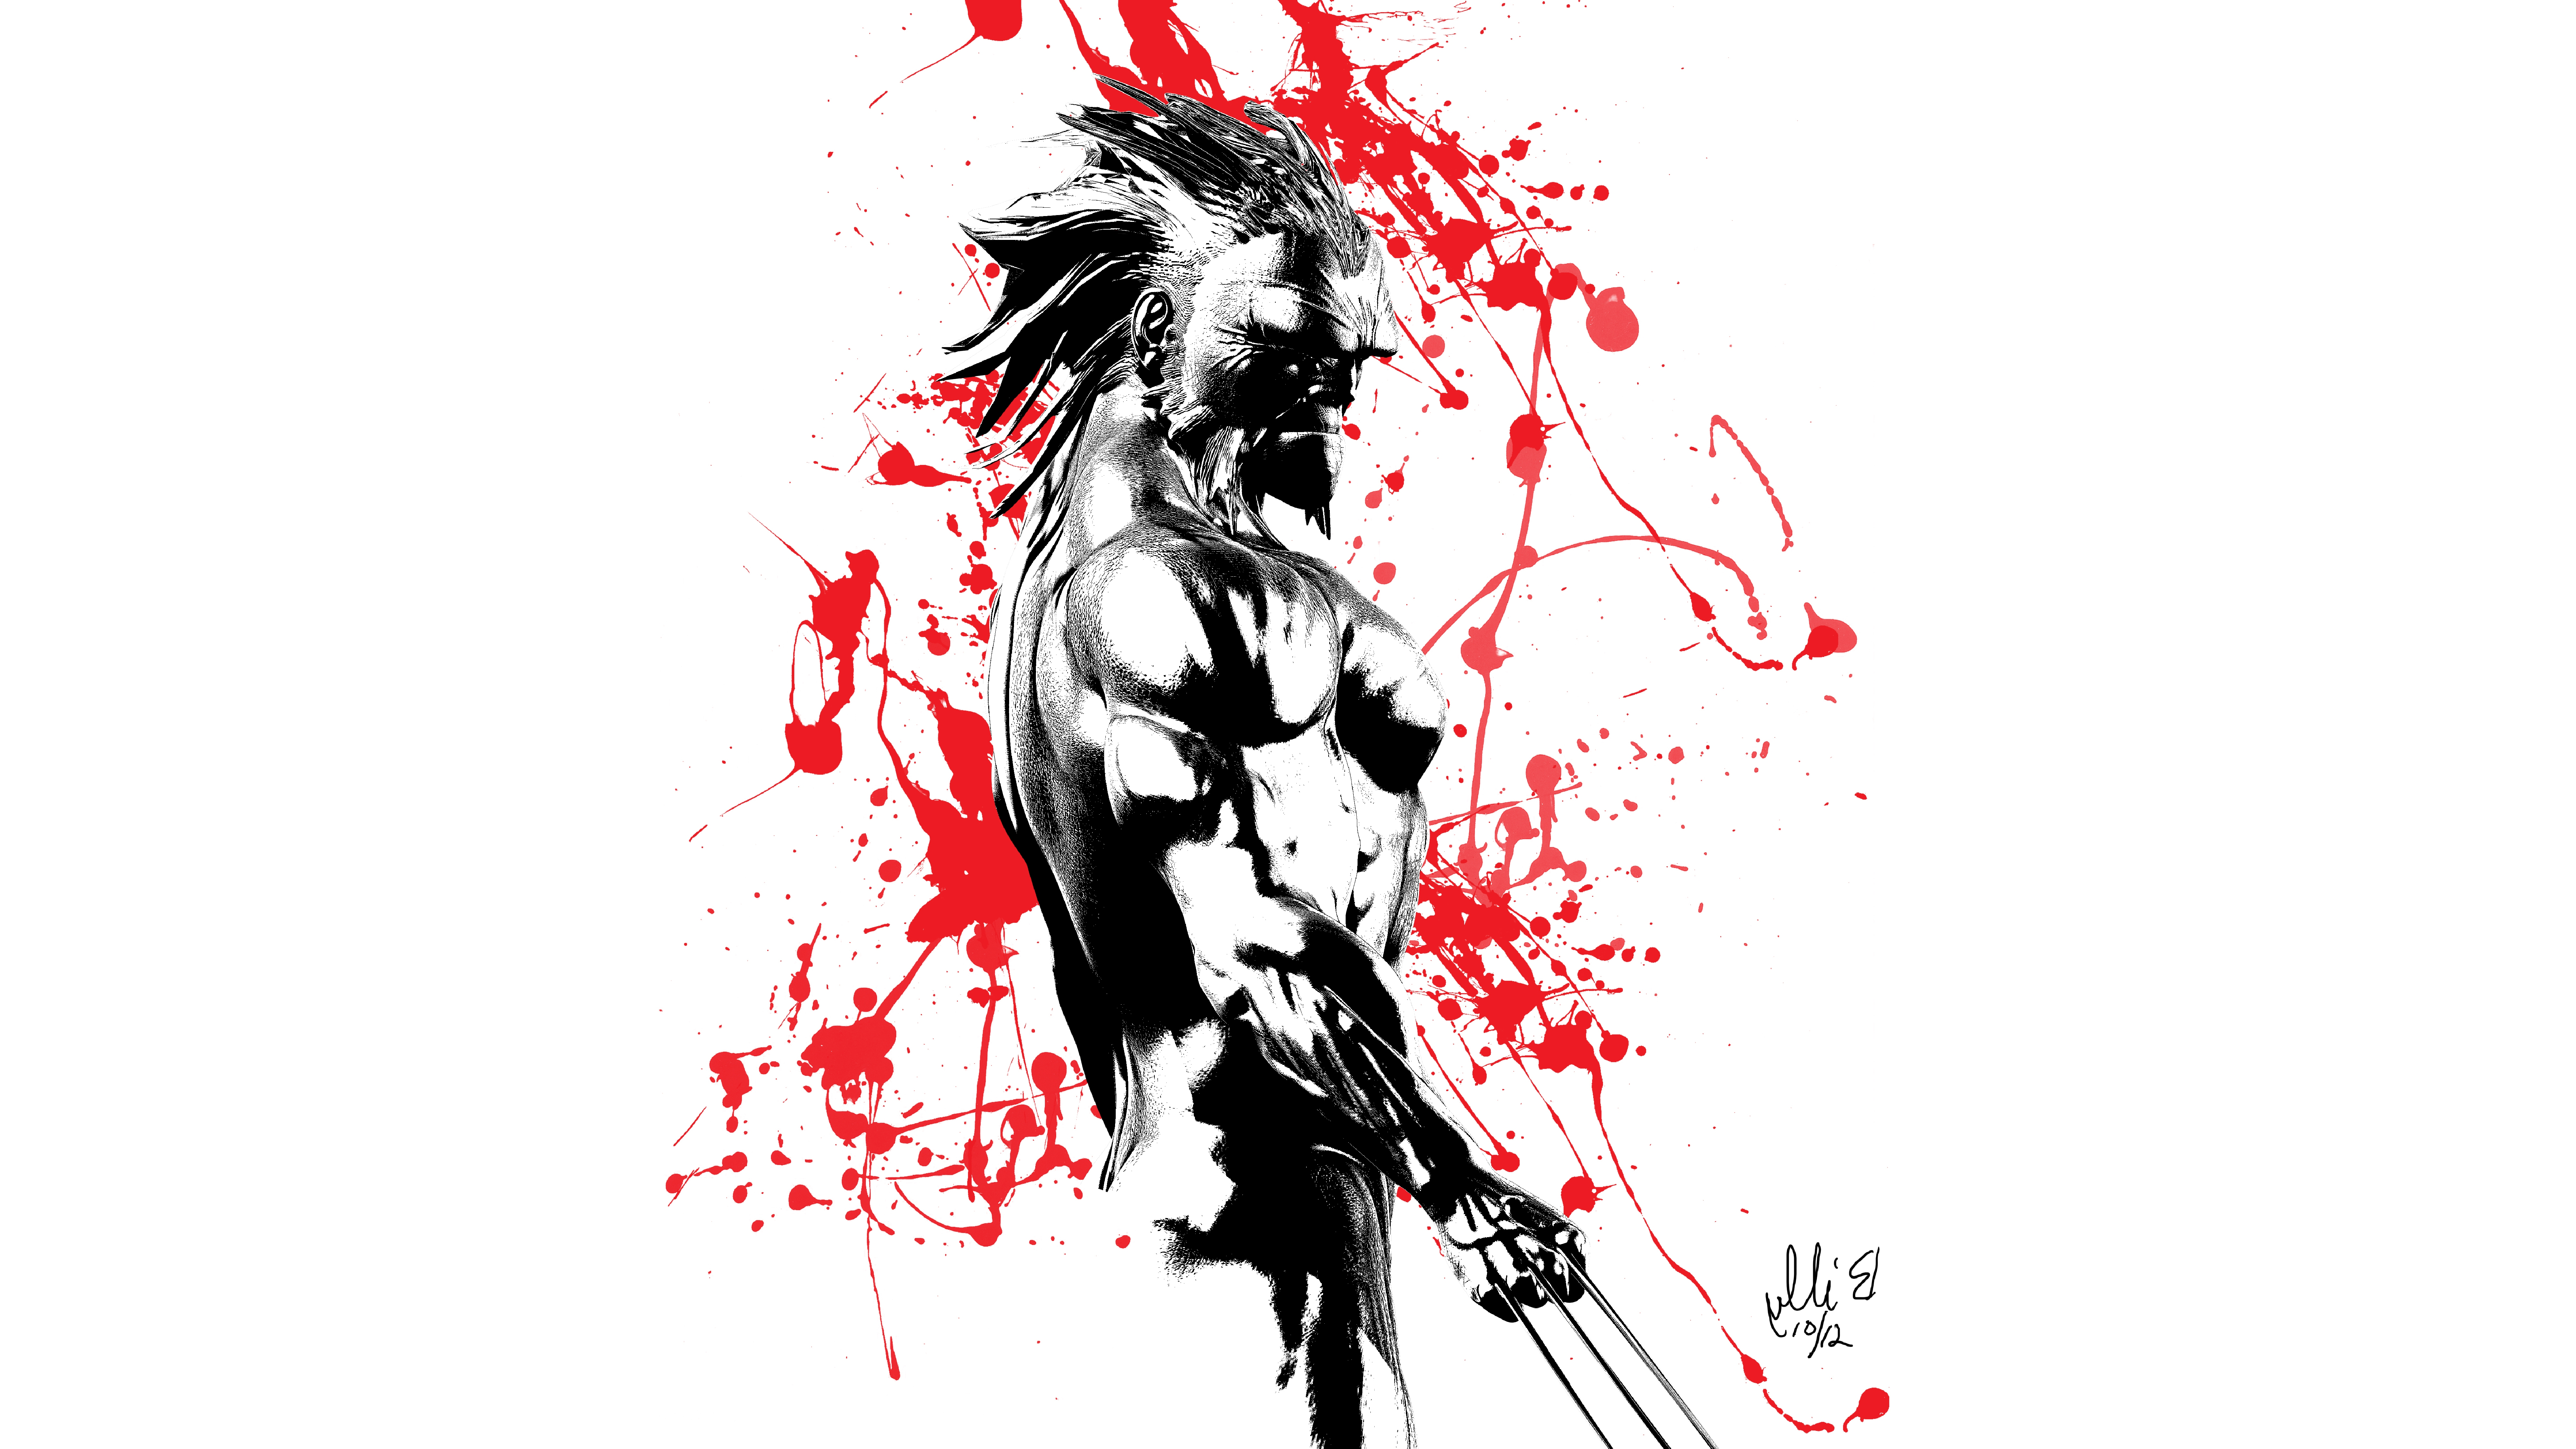 Wolverine 8k ultra hd wallpaper background image 8000x4500 id 517351 wallpaper abyss - Wallpaper wolverine 4k ...